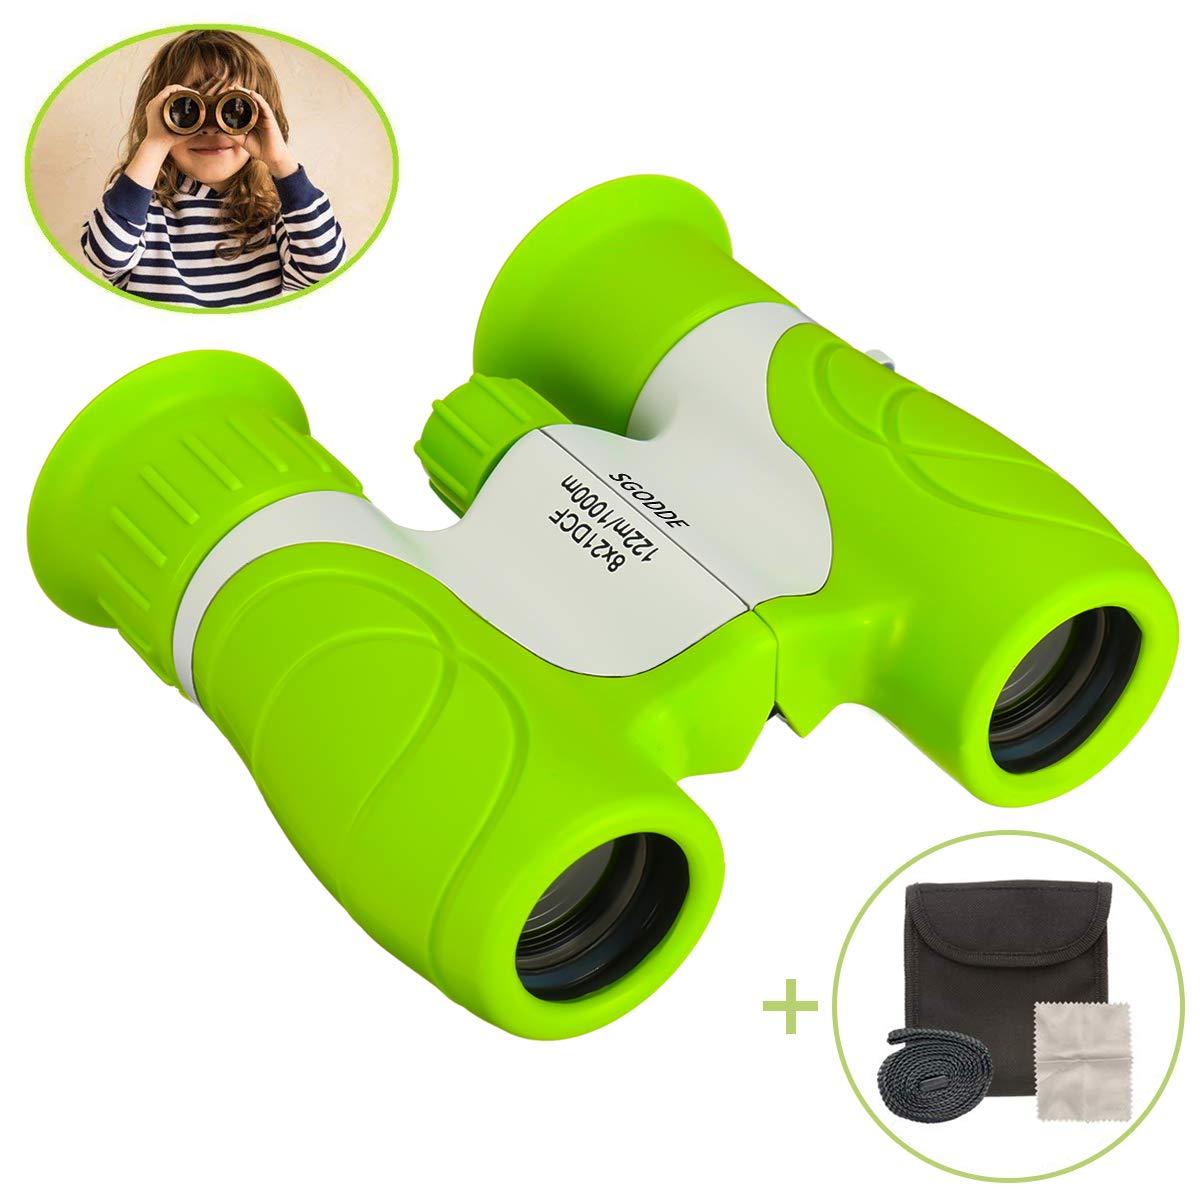 SGODDE 8x21 Kids Binoculars, Small Binoculars-Shock Proof,Waterproof,HD Vision,Teens Toys Telescope,Children Gifts for Outdoor Camping, Hunting, Hiking,Travelling,Concert Green Compact